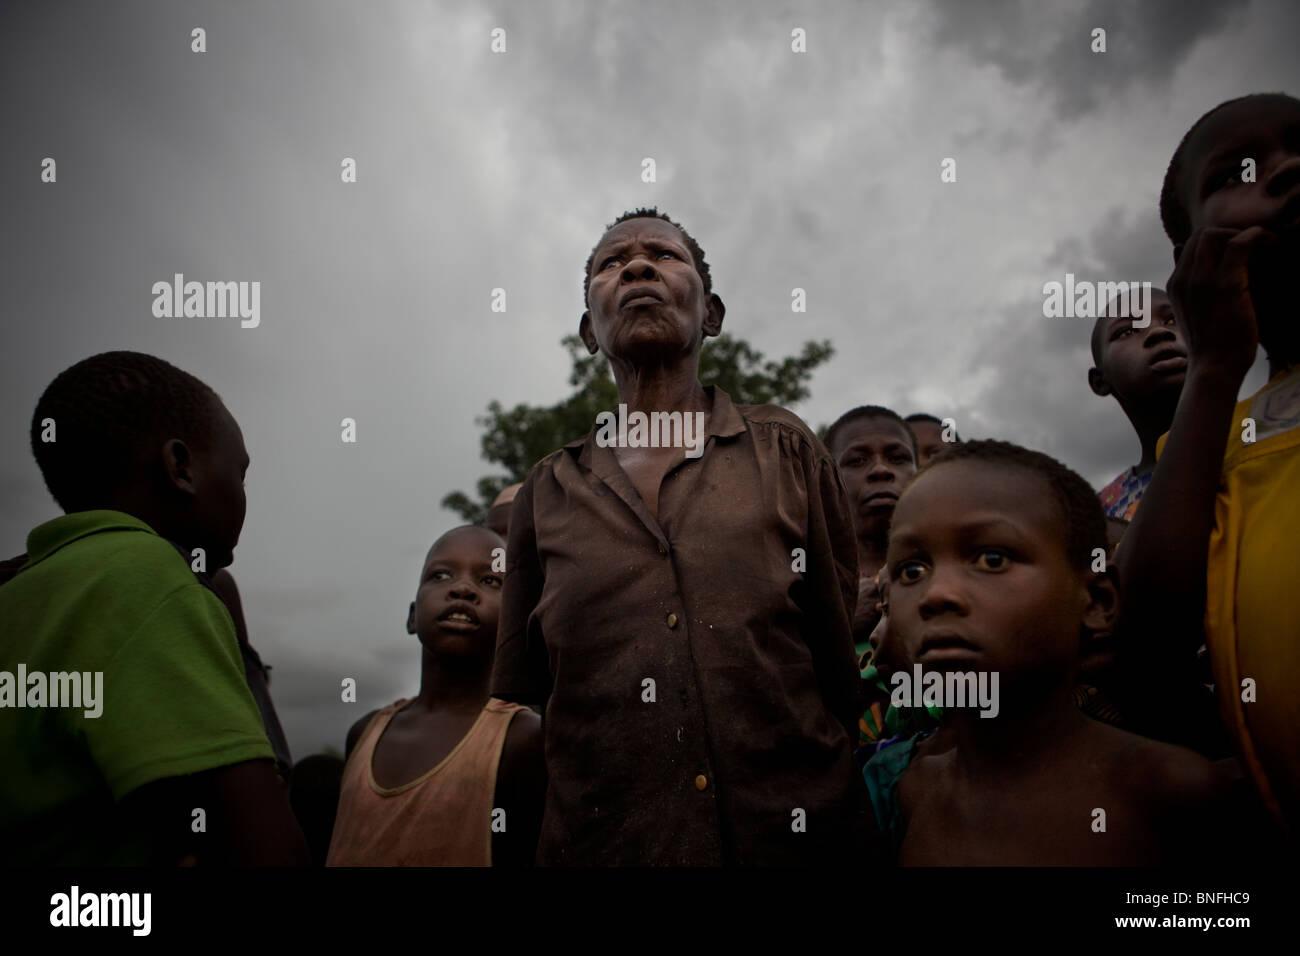 Villagers in northern Uganda under dark skies. - Stock Image